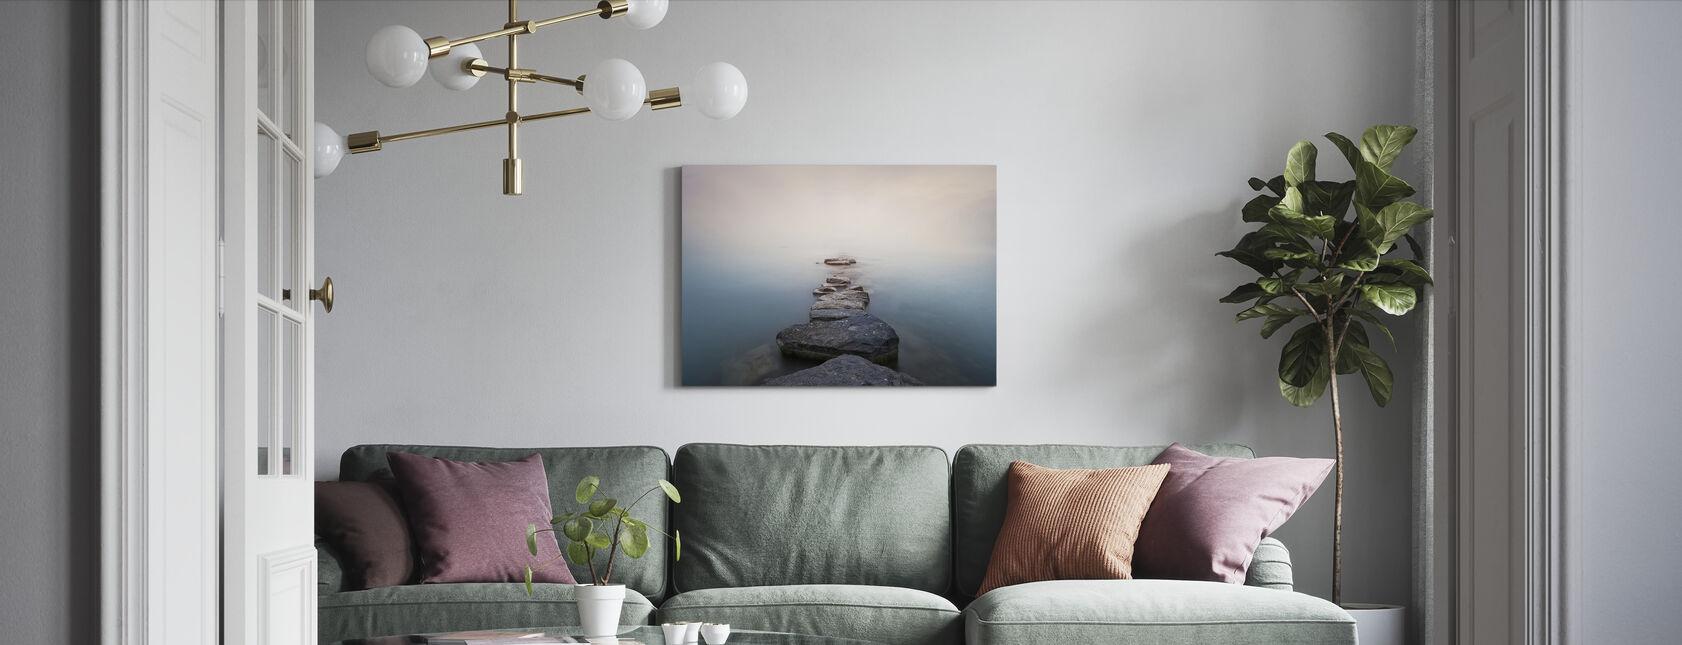 Piedras - Lienzo - Salón